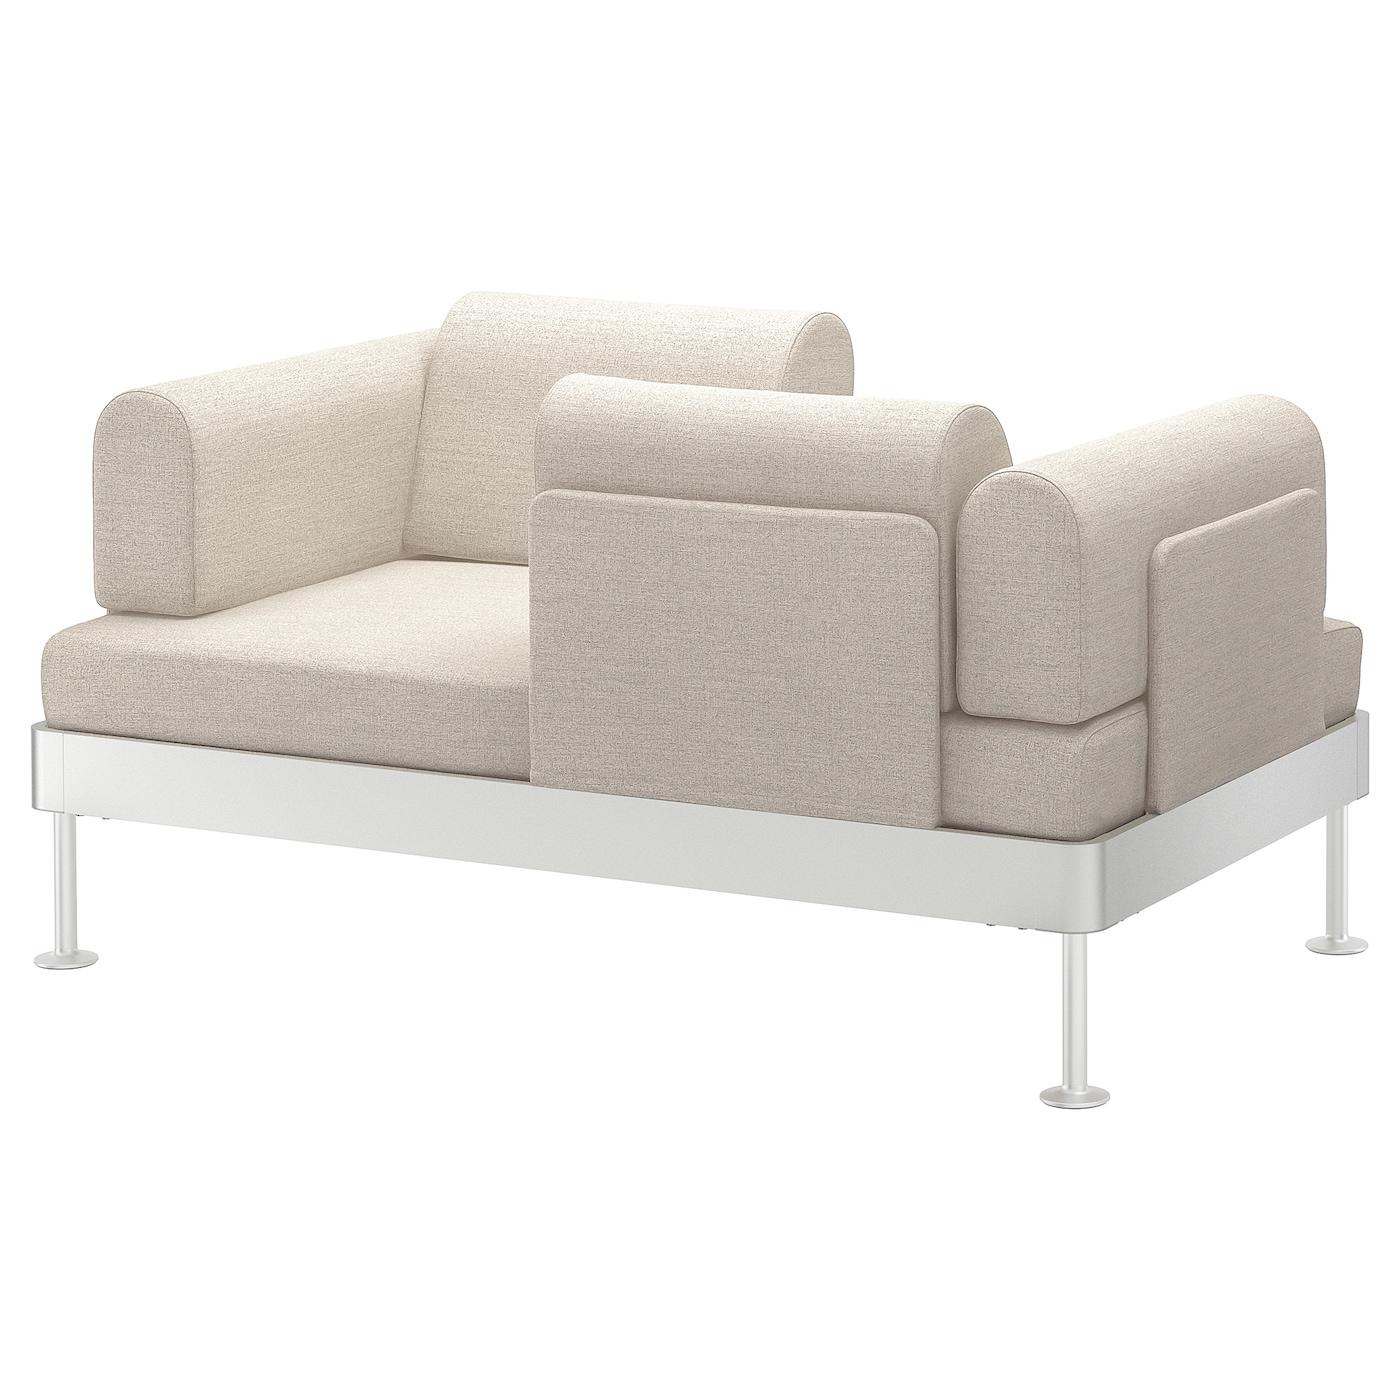 IKEA DELAKTIG Sofa 2-osobowa, Gunnared beżowy